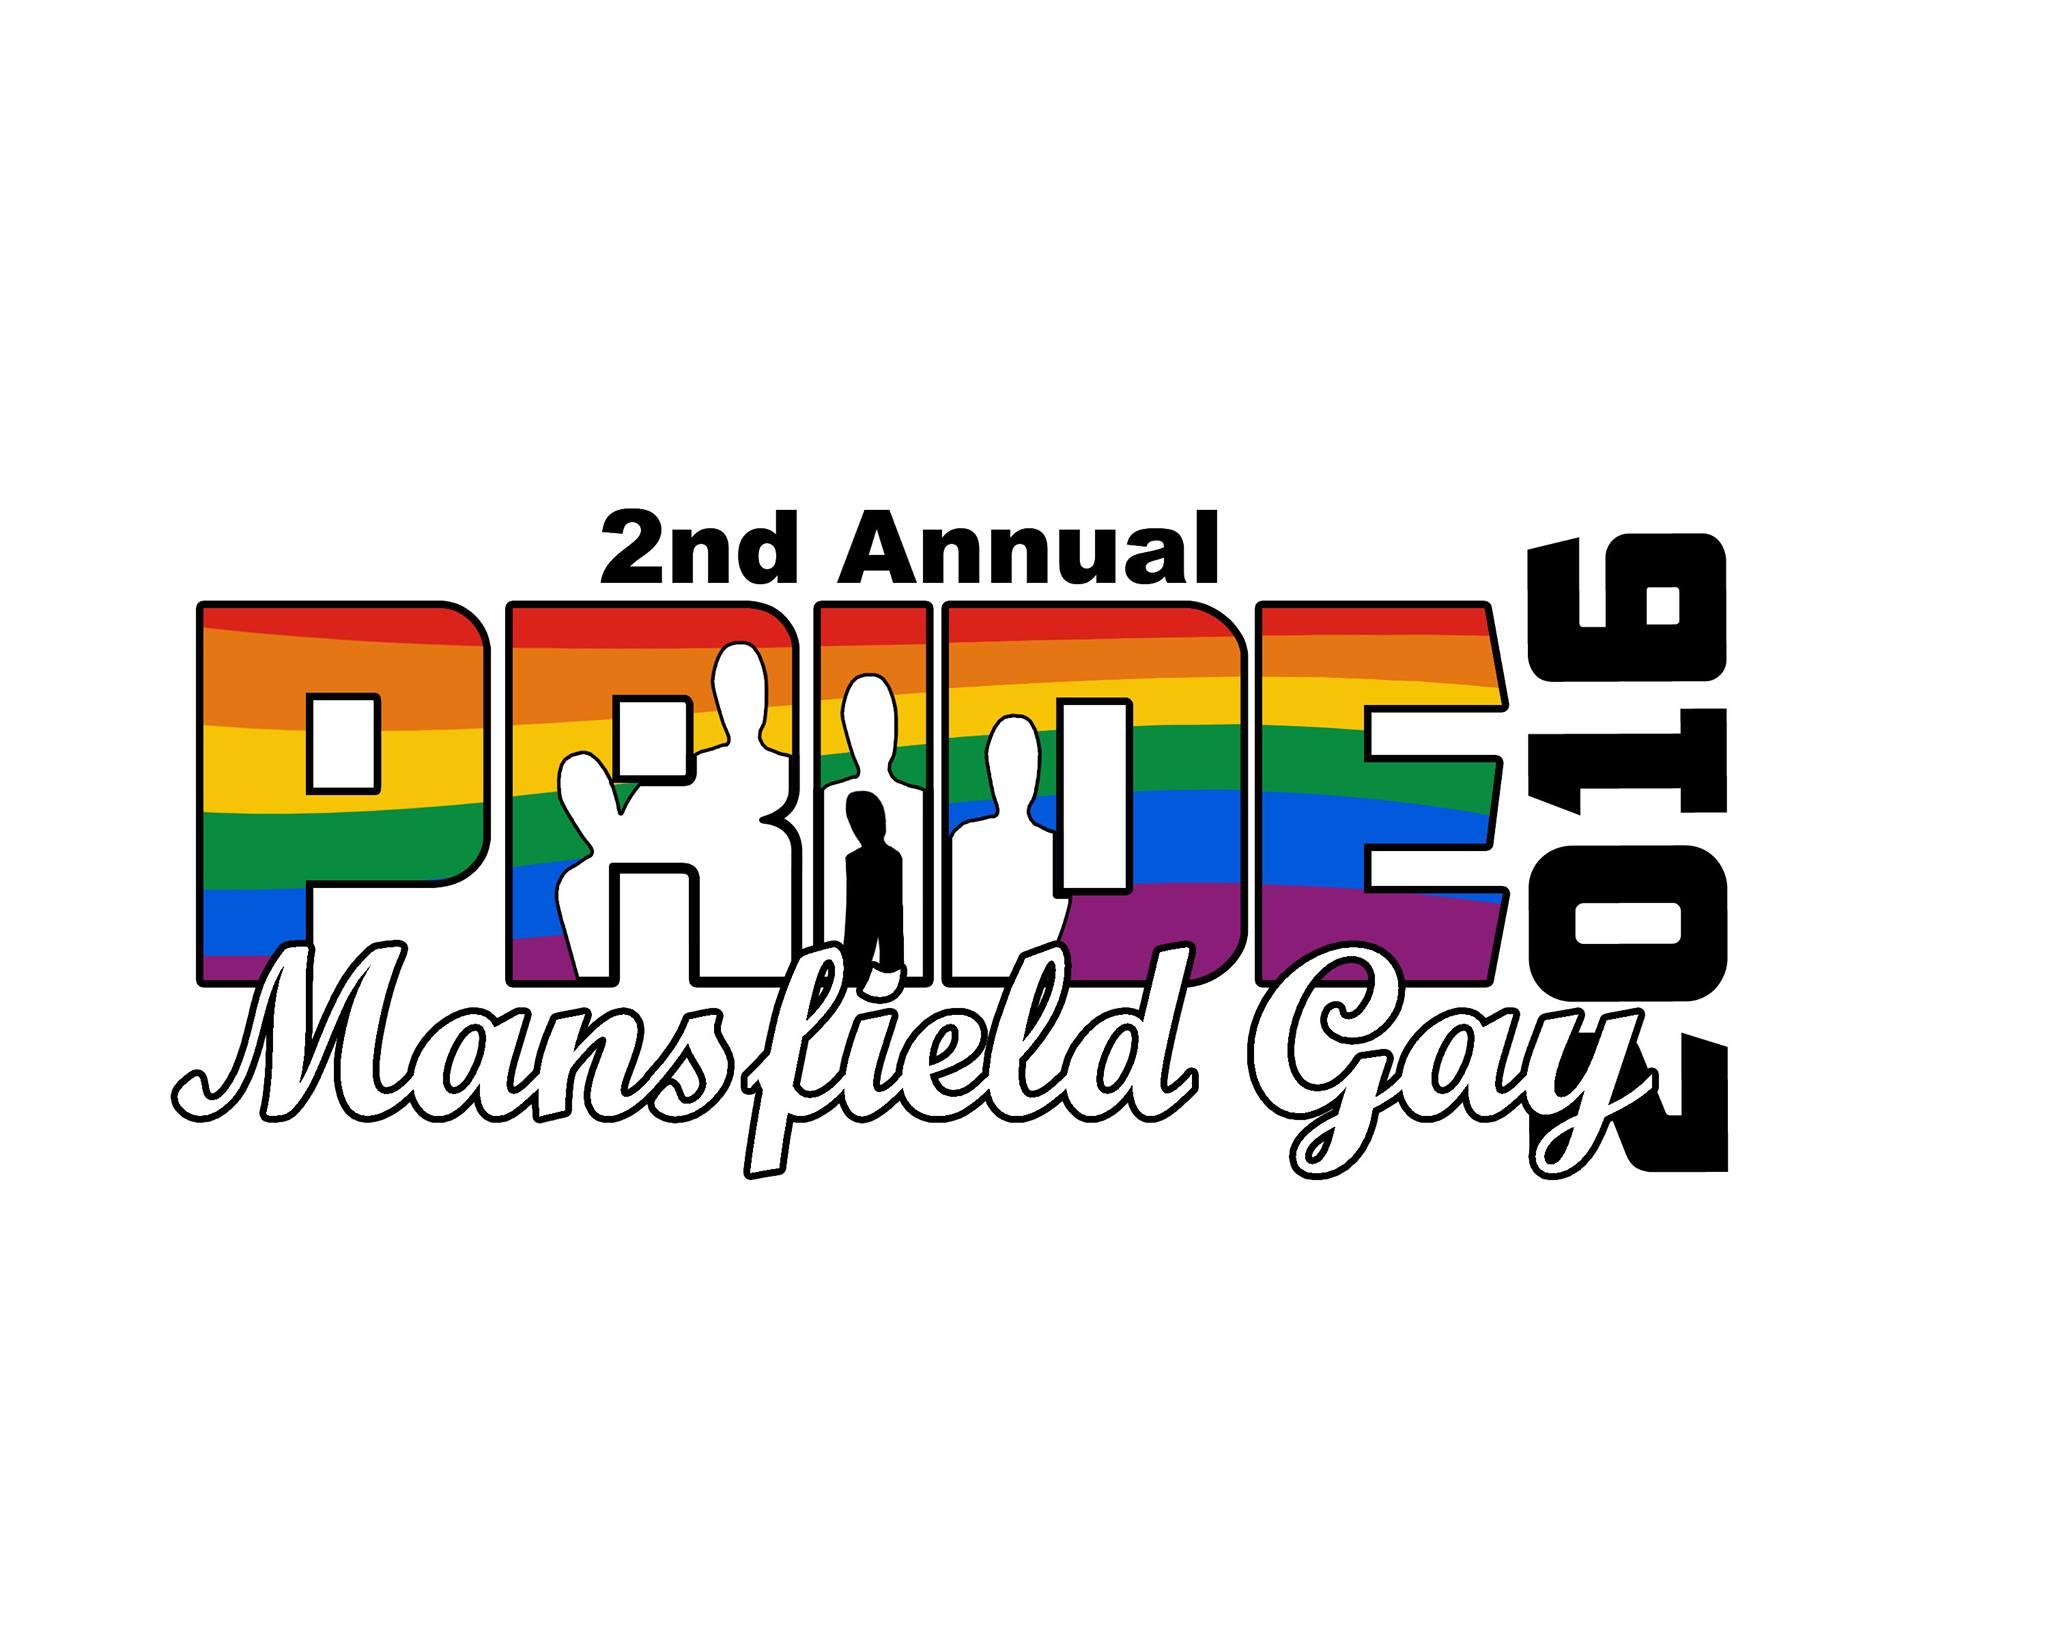 2nd Annual Gay pride Festival